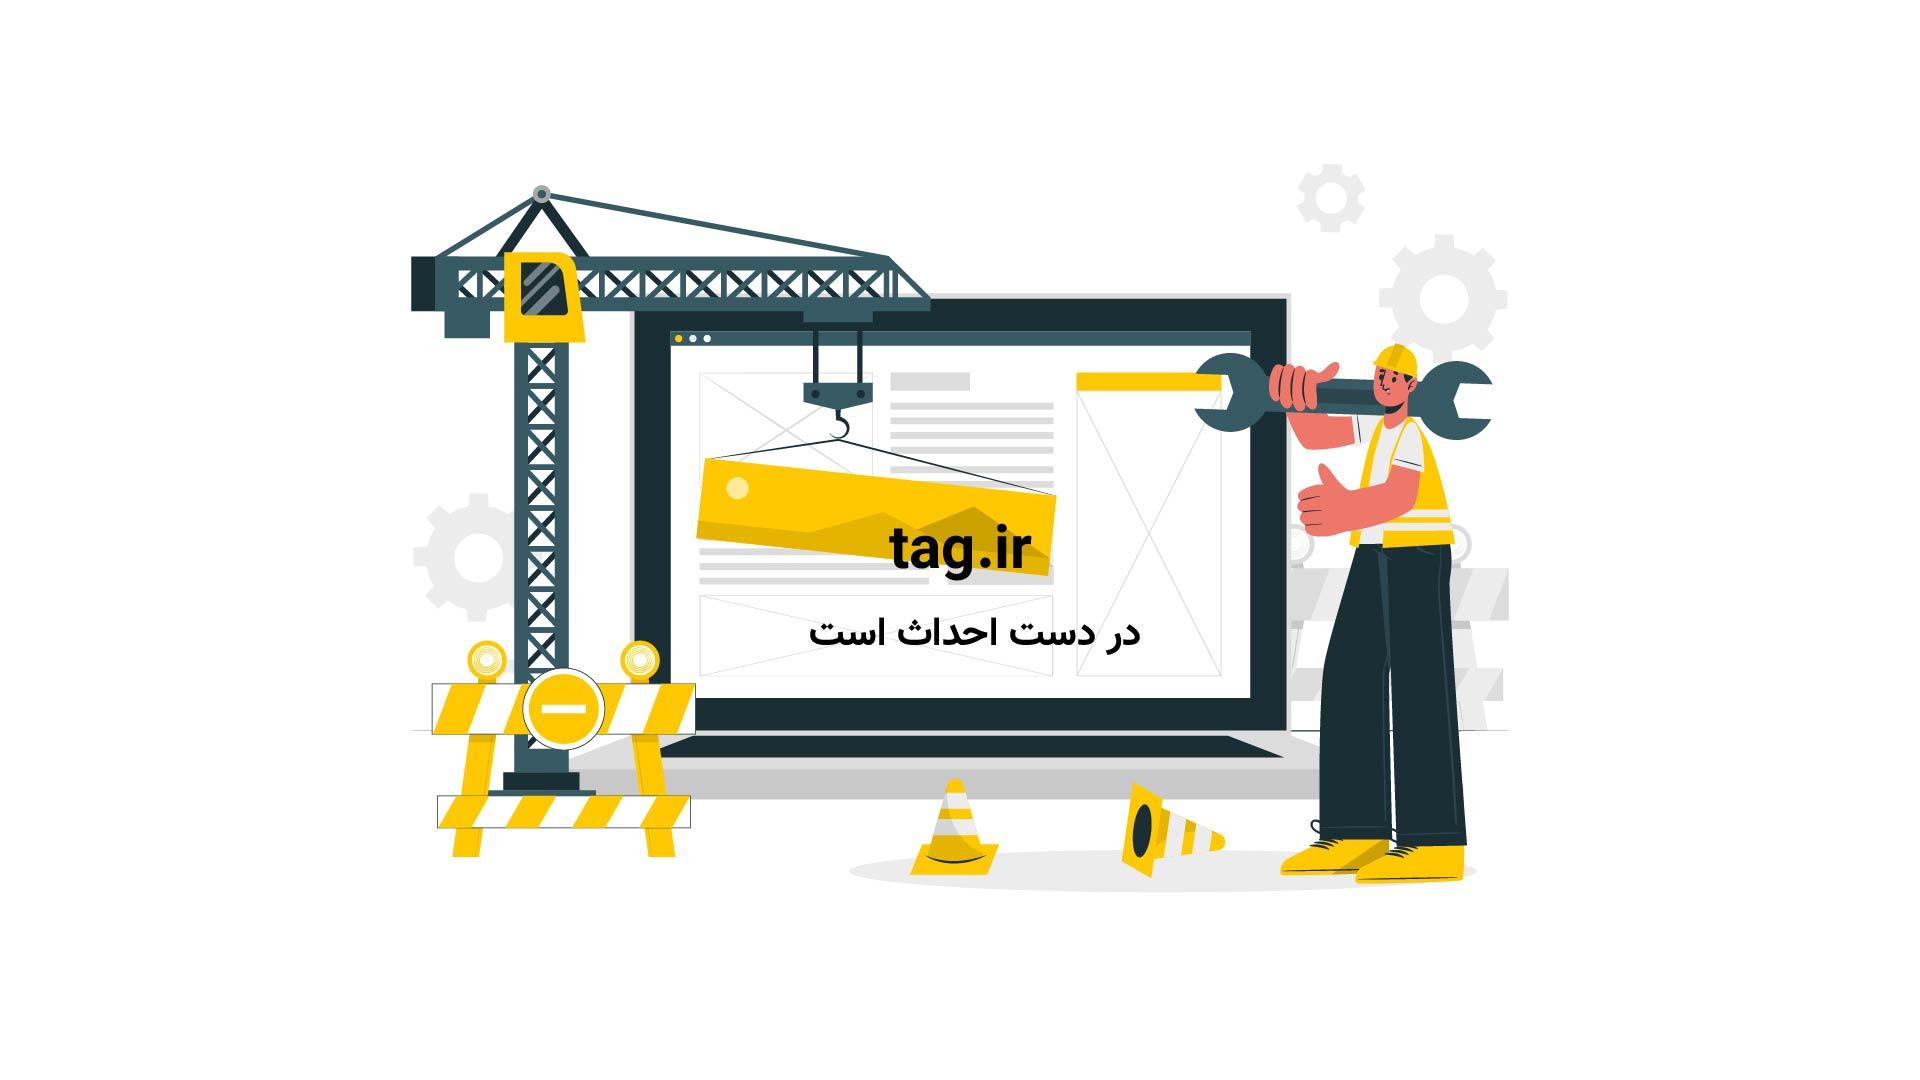 انیمیشن طنز پیام تبریک رونالدو، مسی و دیگر بازیکنان و مربیان فوتبال | فیلم